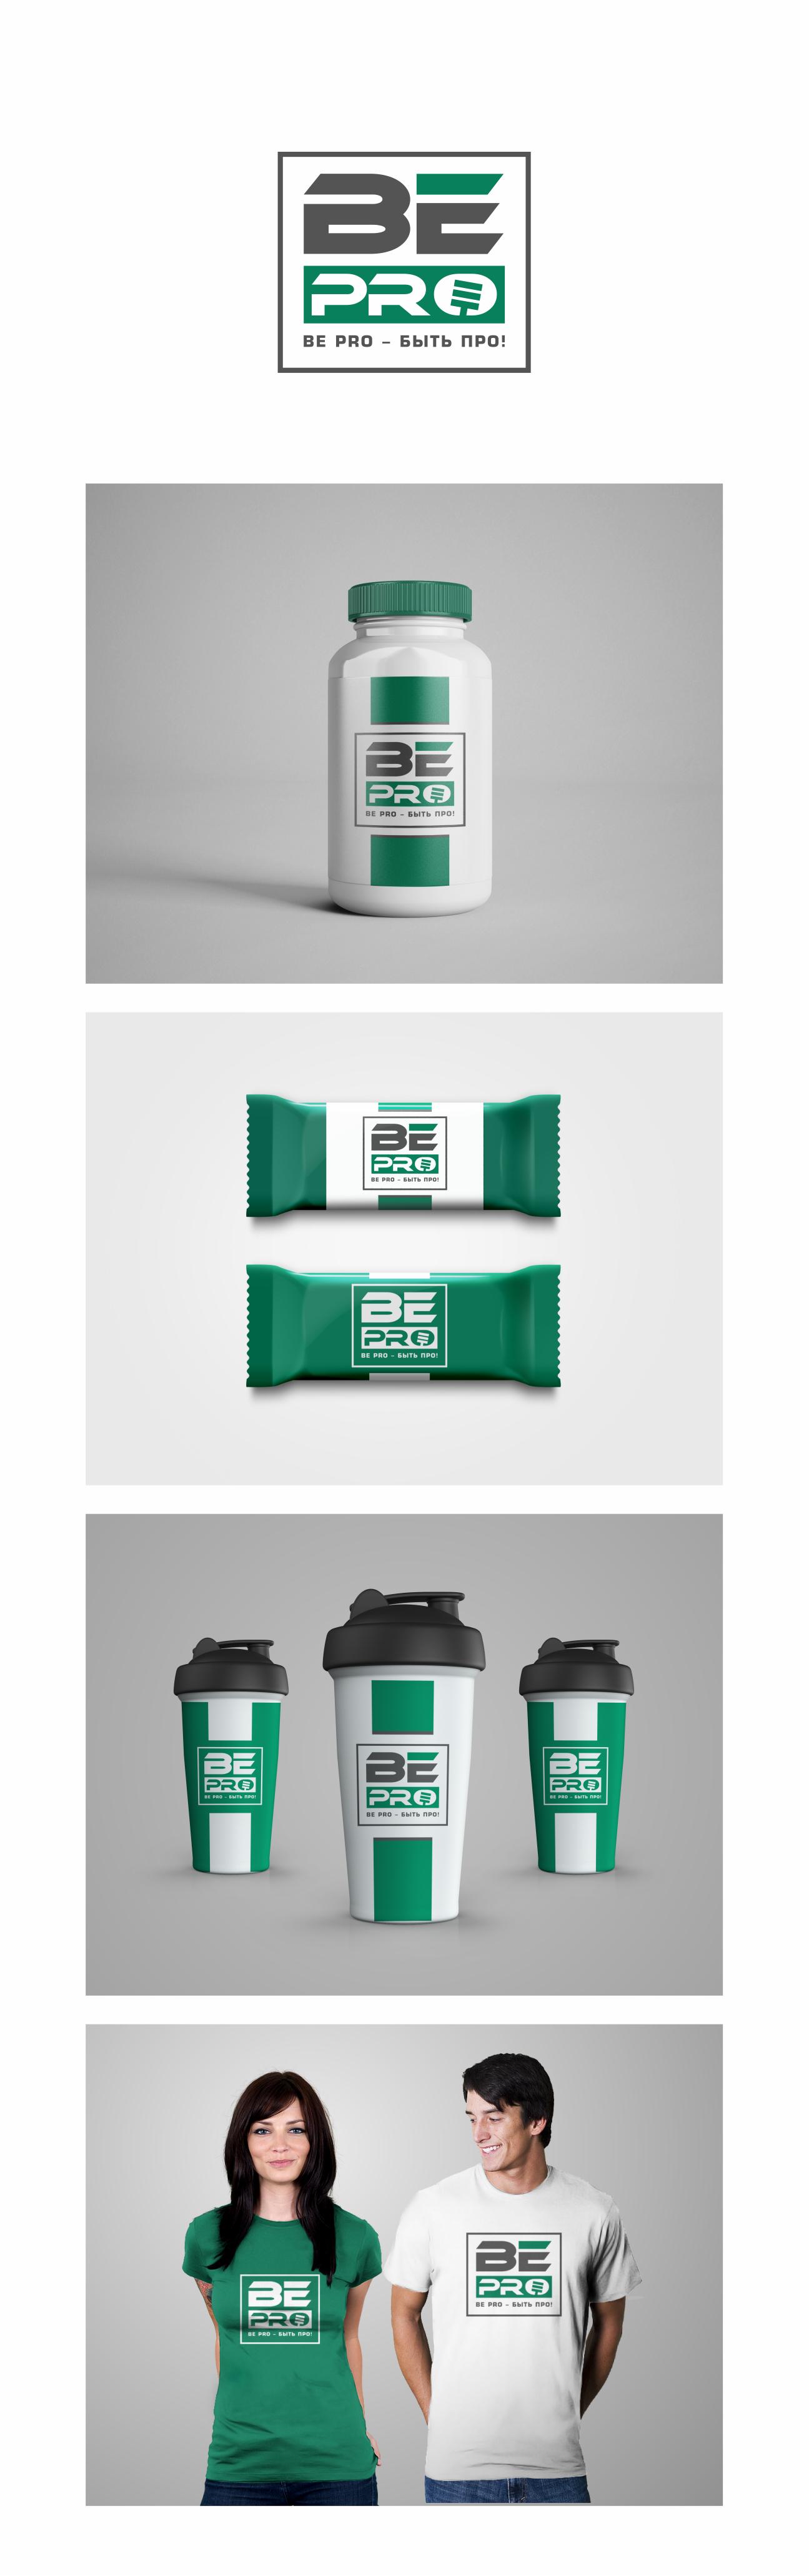 Лого+символ для марки Спортивного питания фото f_9995971c3a3ba31e.jpg